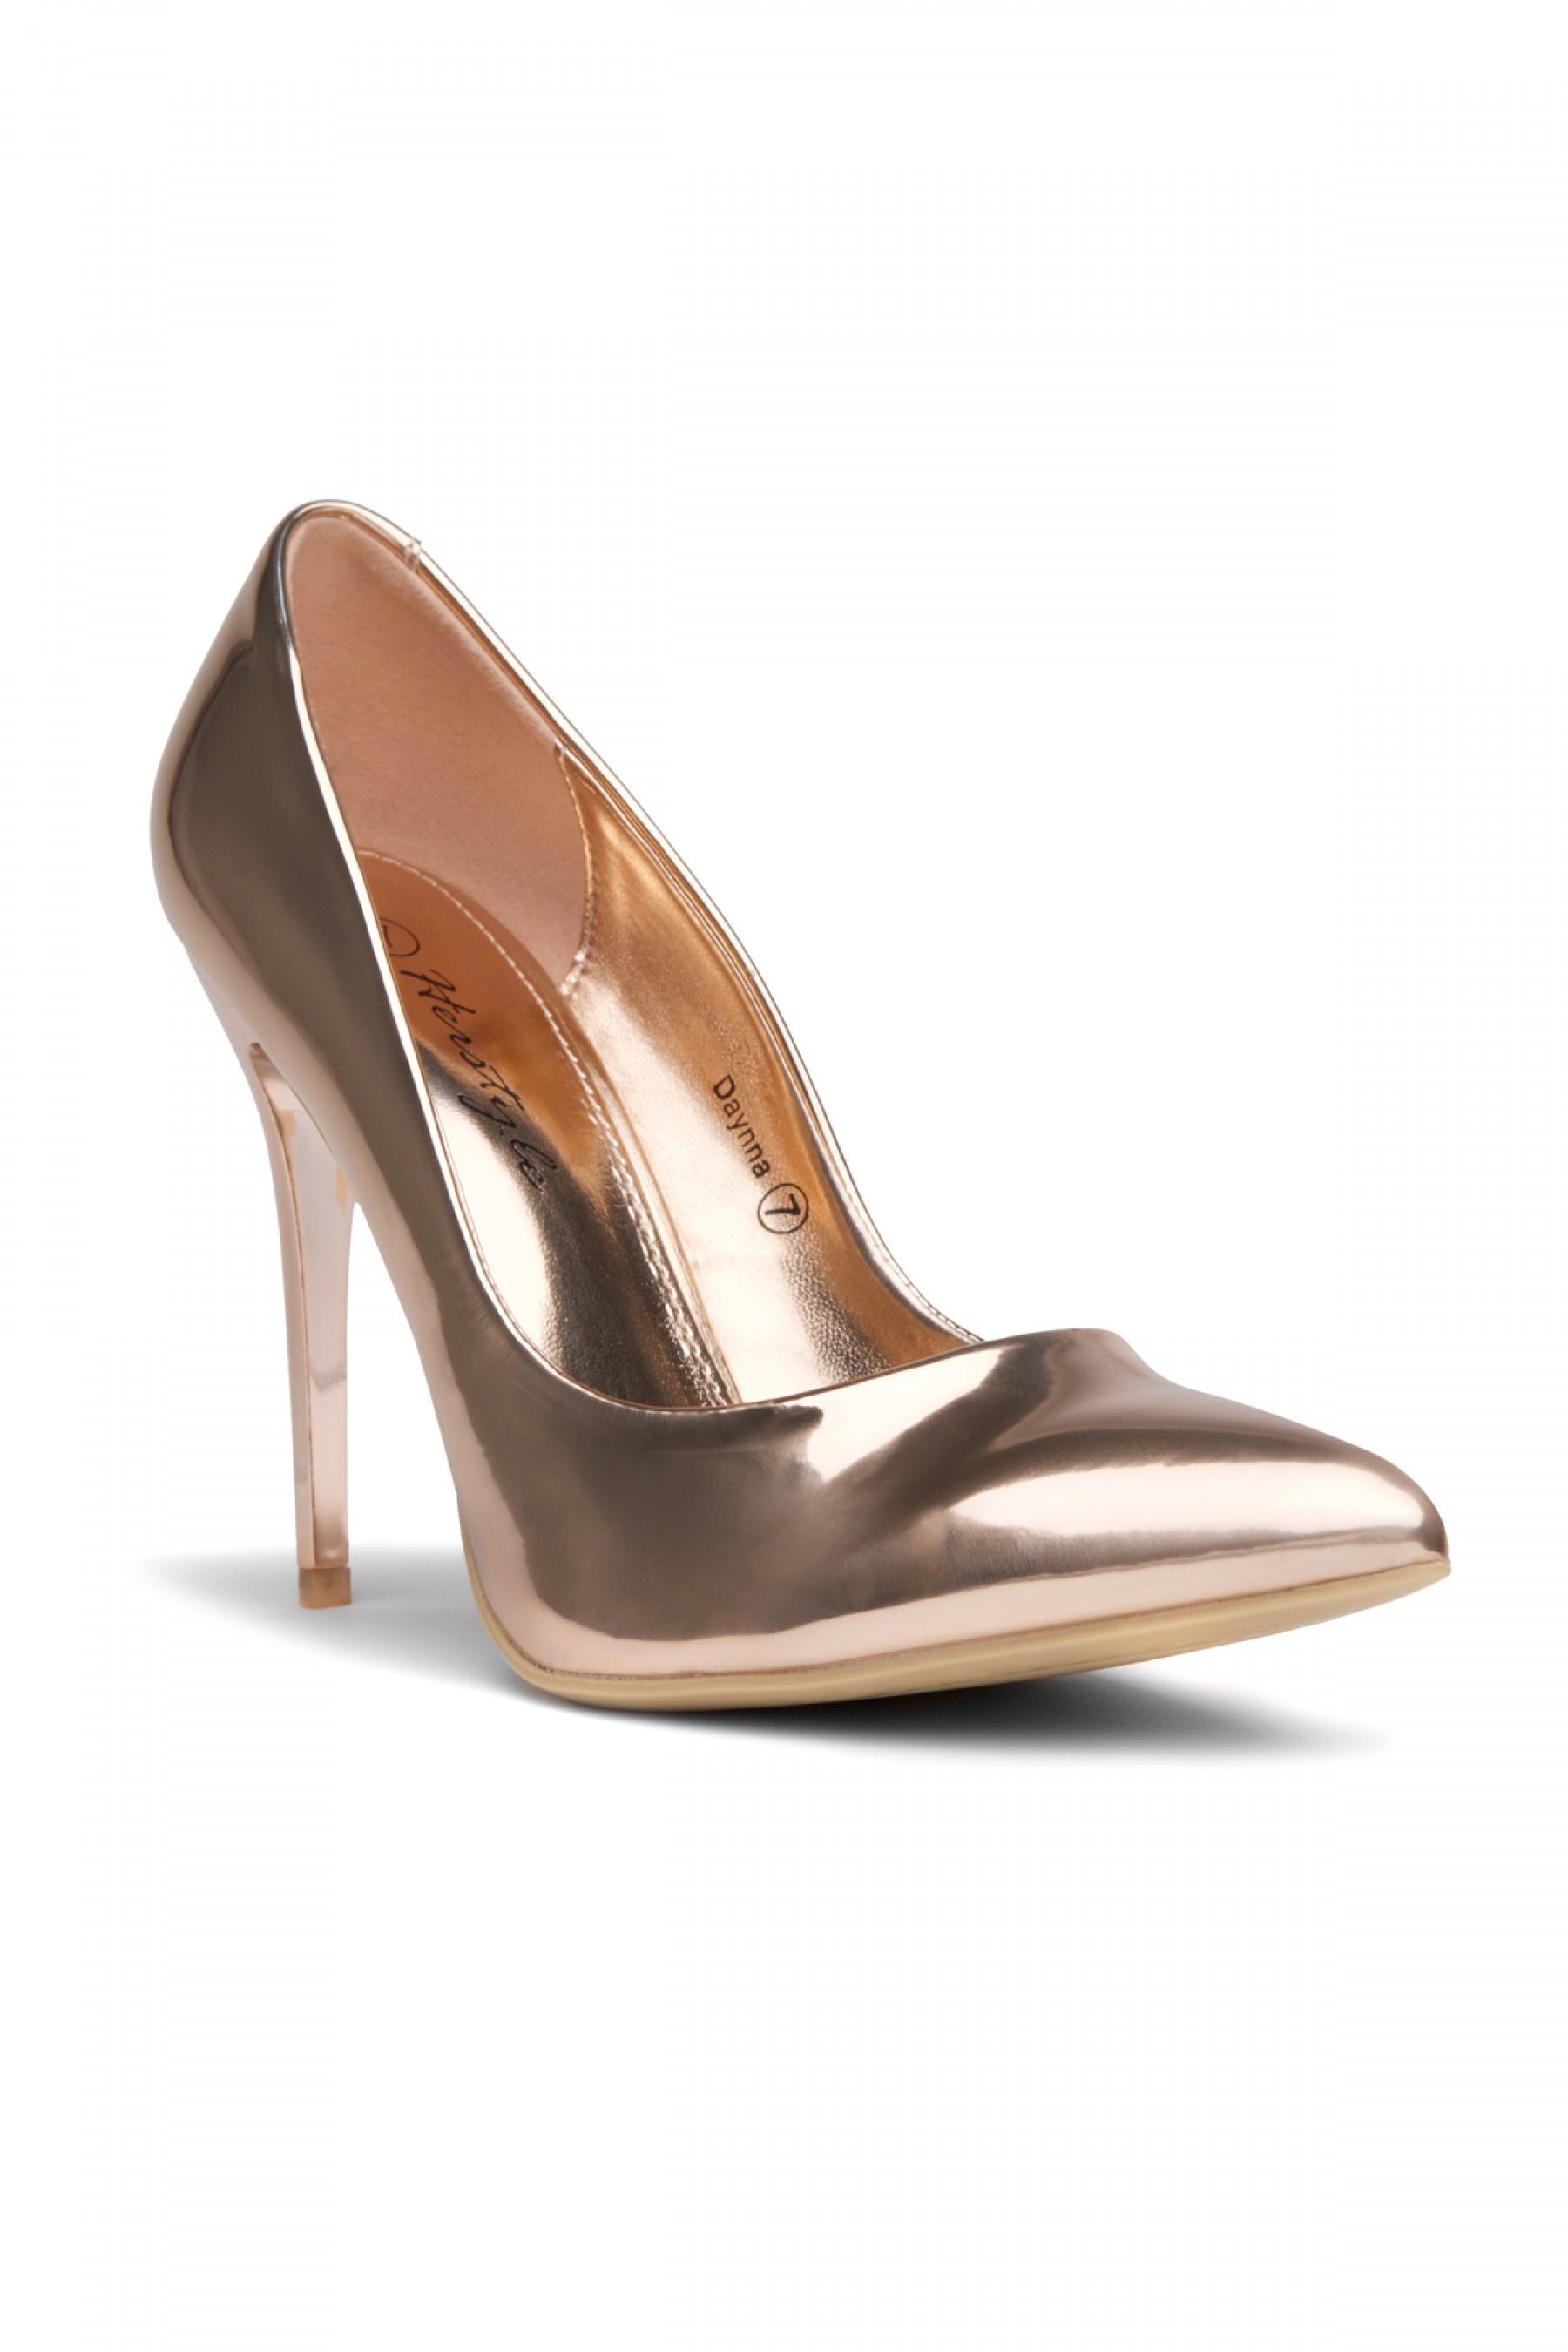 HerStyle Daynna Pointy Toe Stiletto Pump - Rose Gold